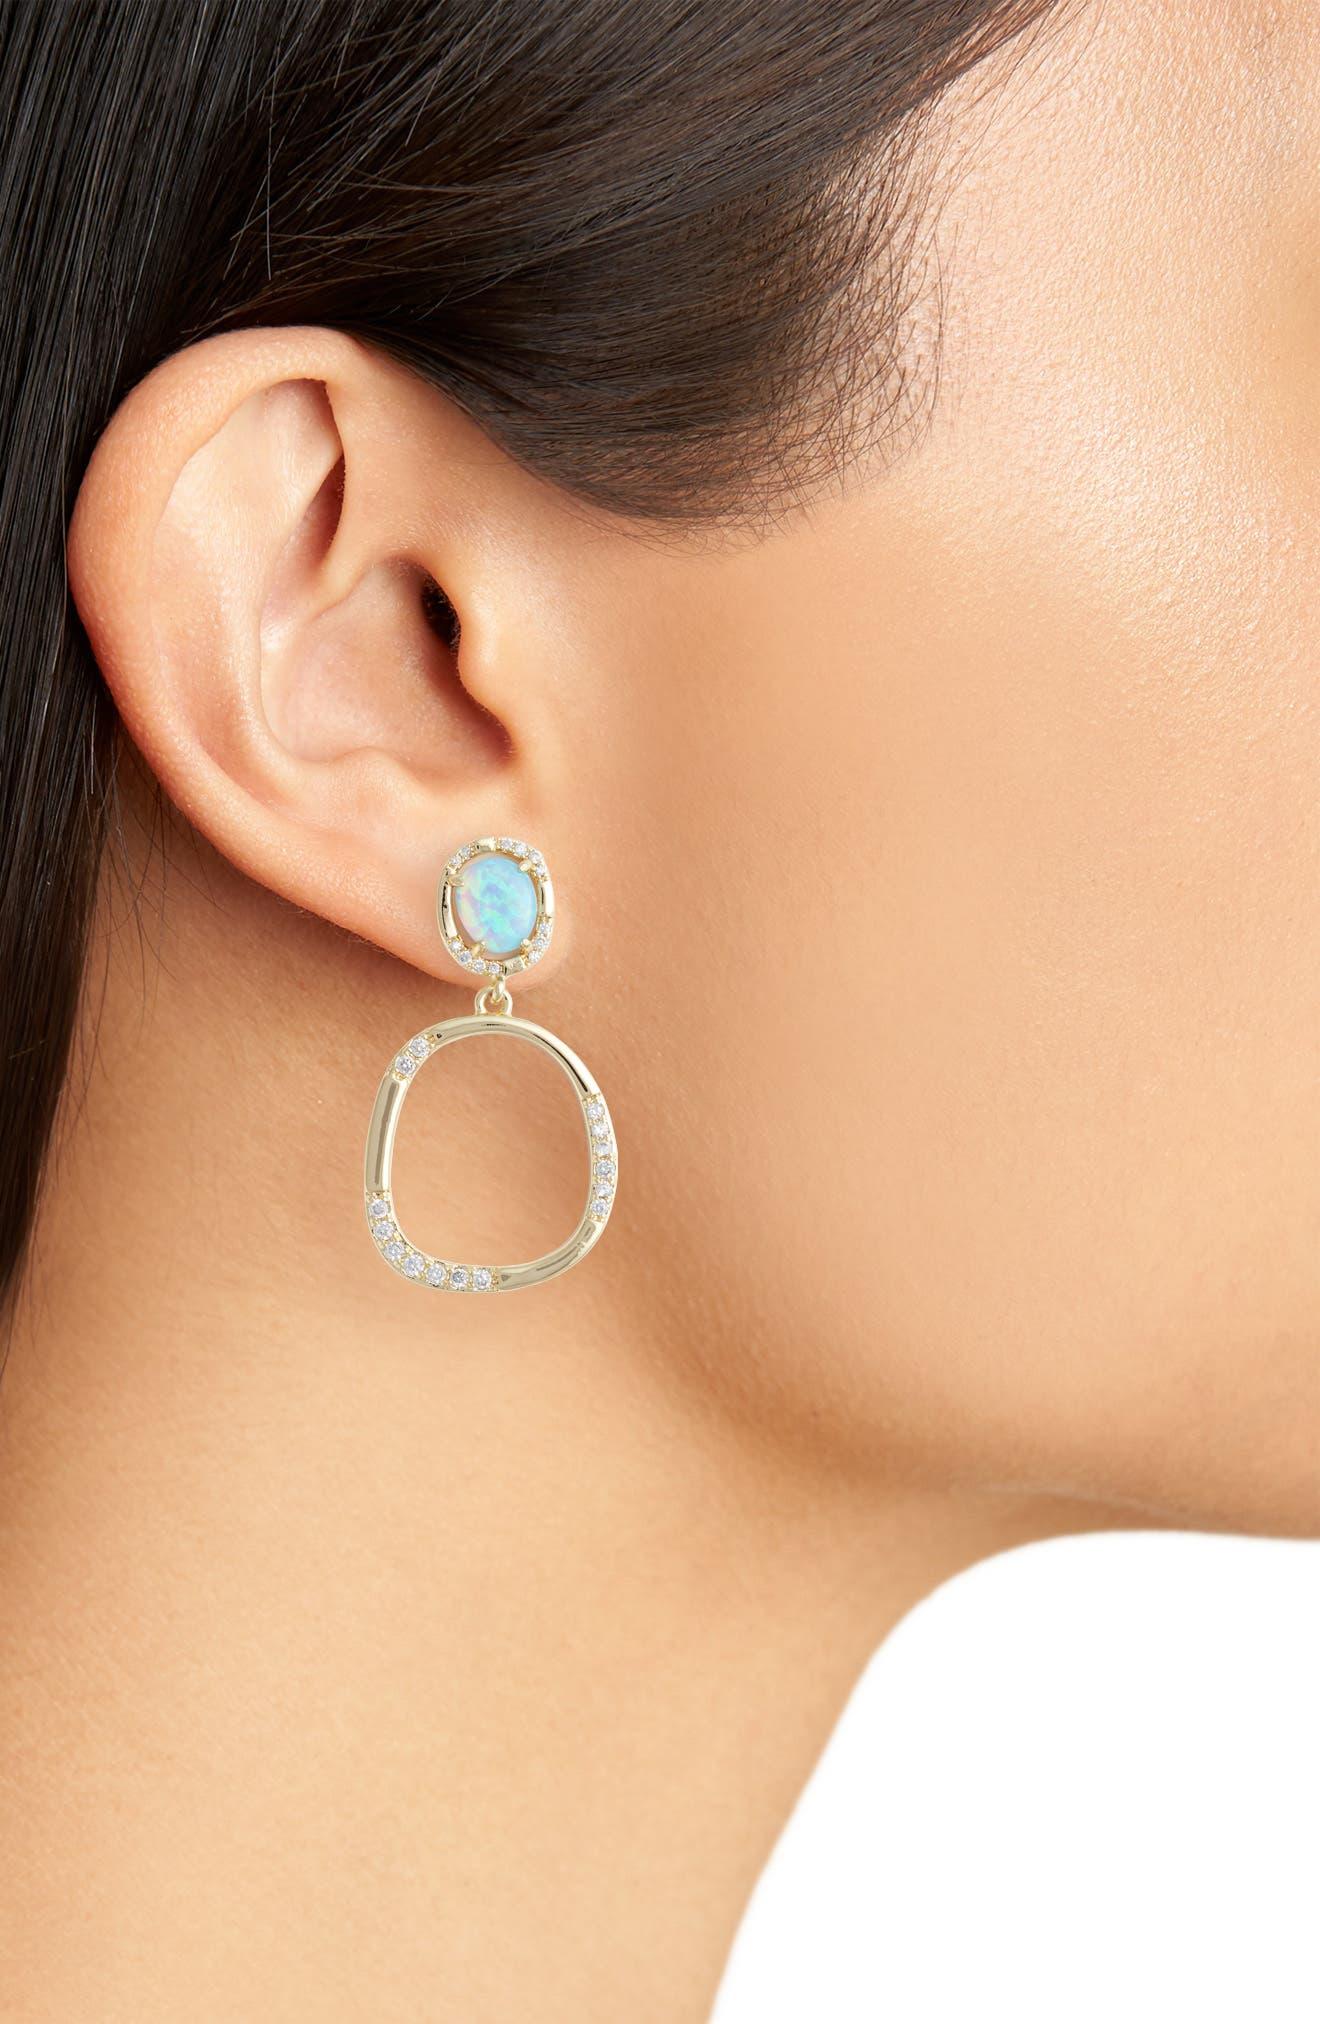 Luna Opal Drop Earrings,                             Alternate thumbnail 2, color,                             400